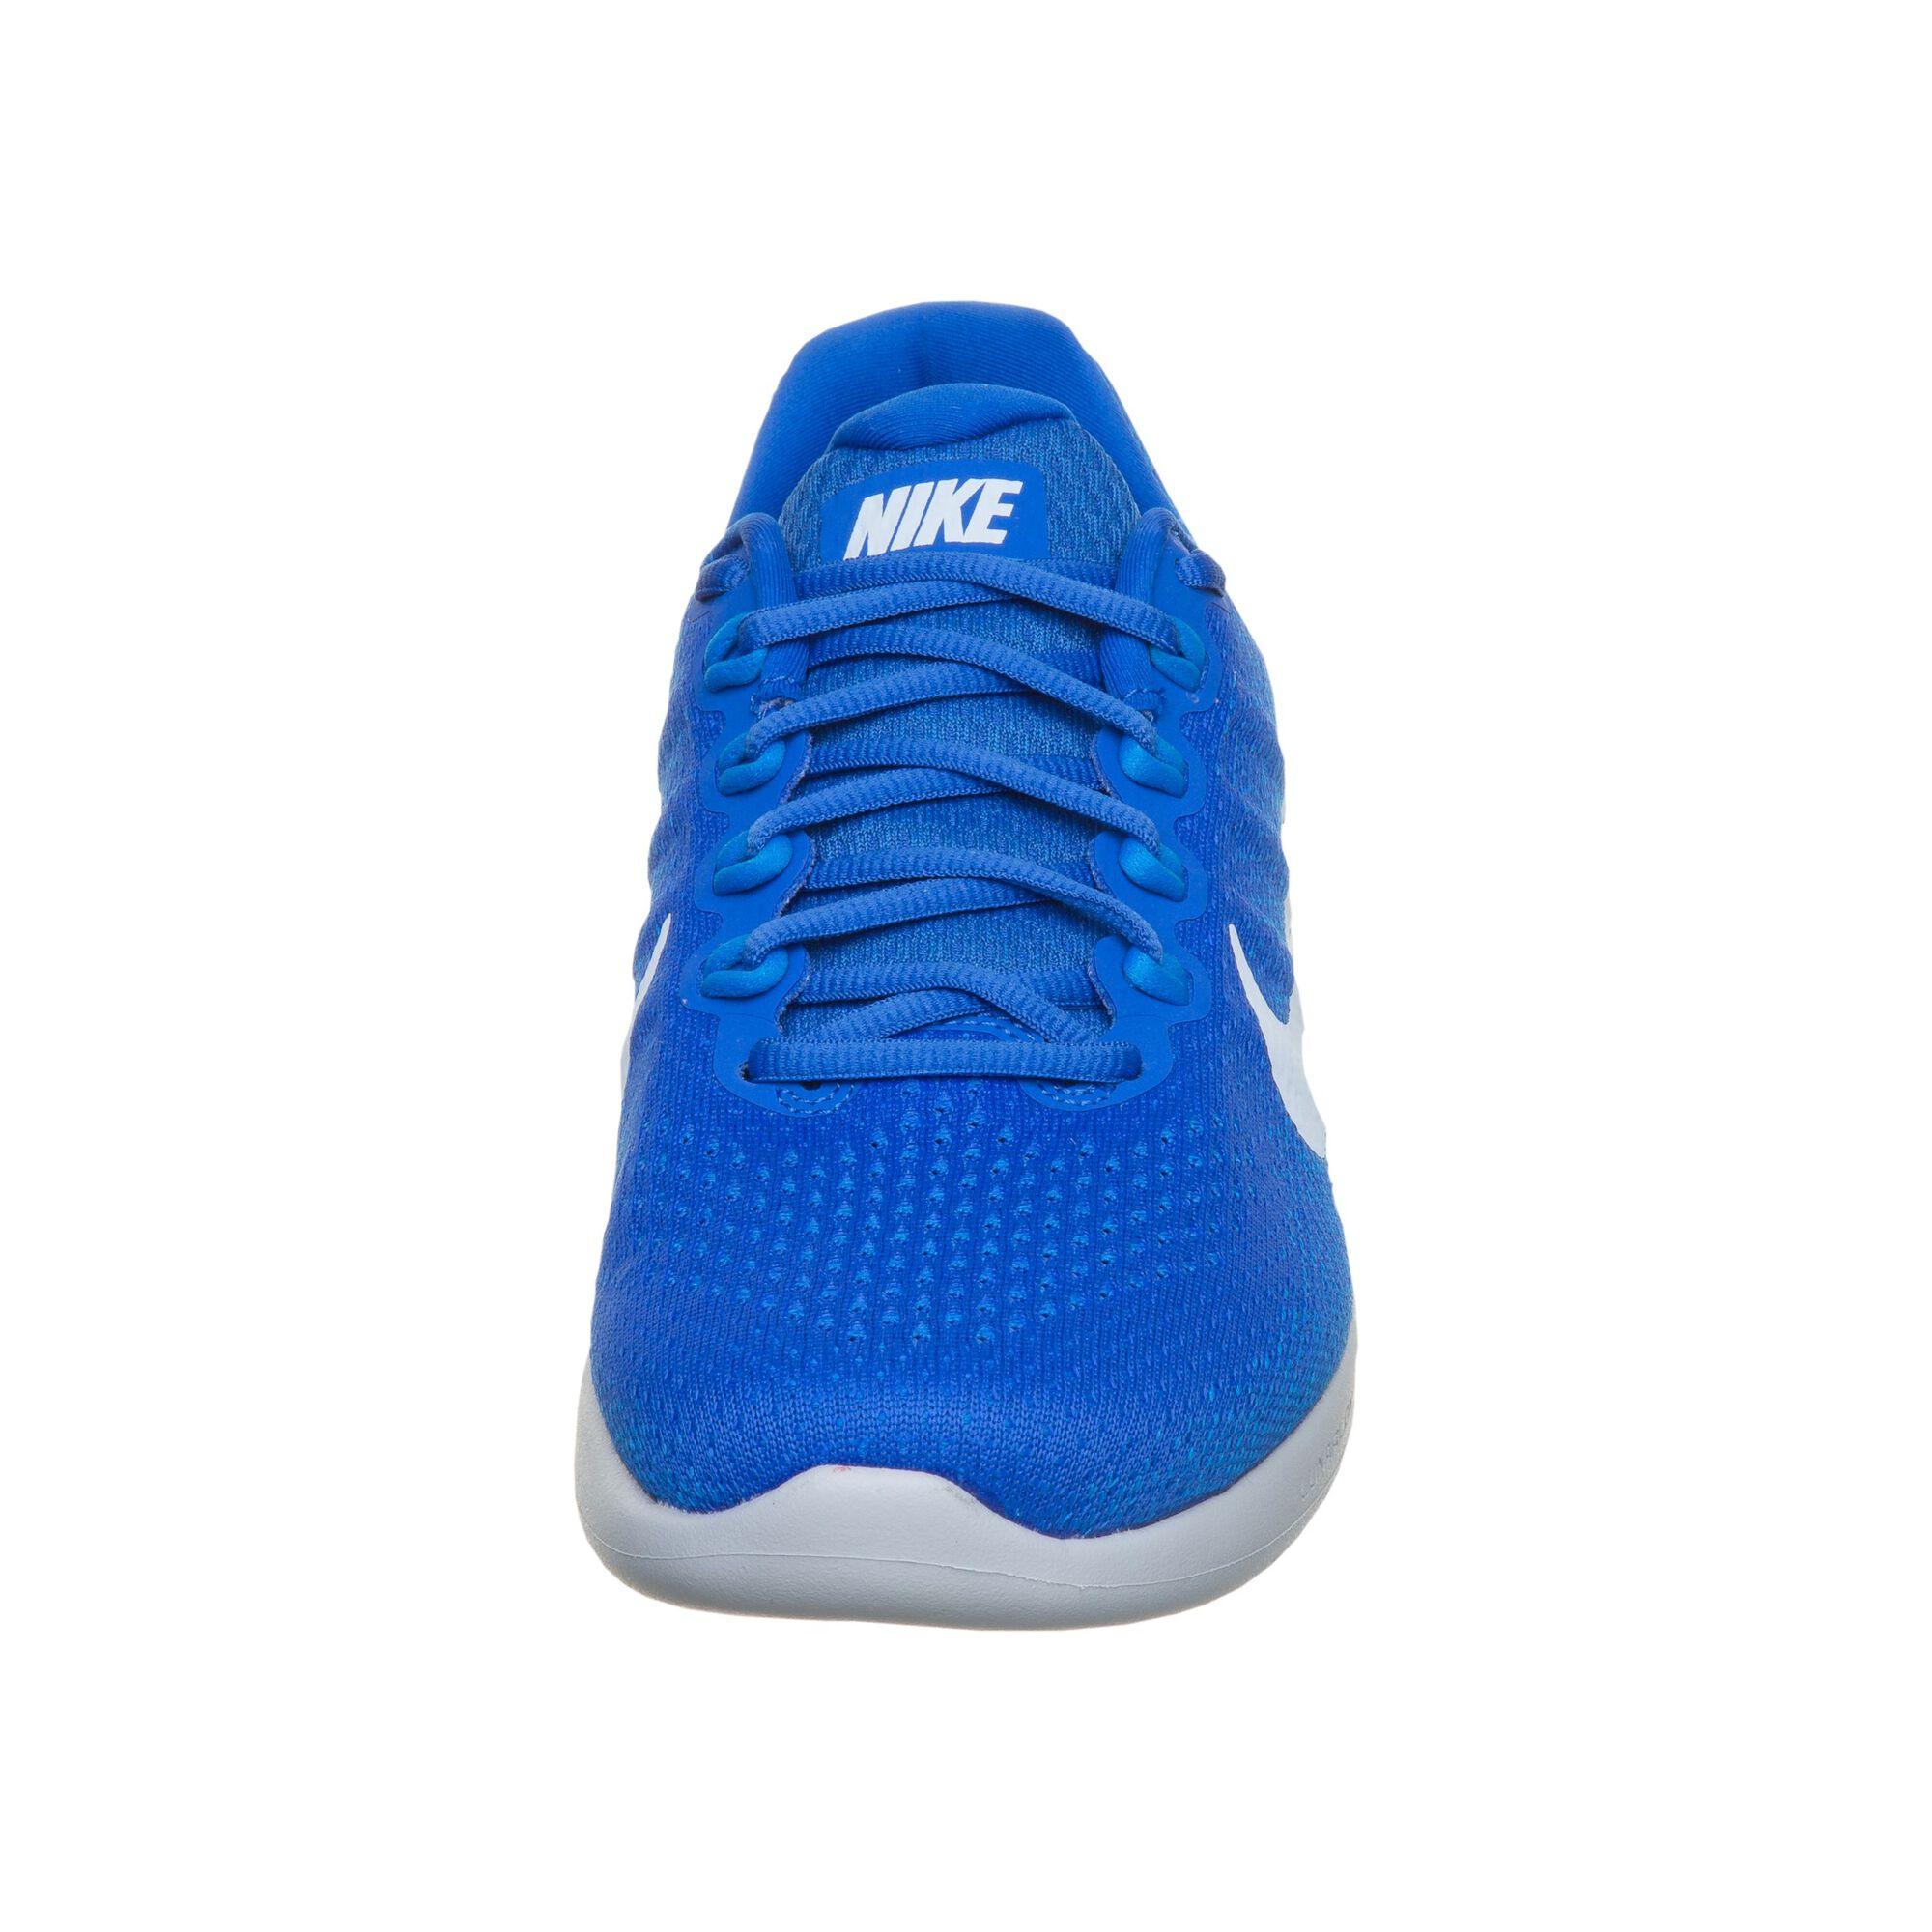 new styles 572e8 420a3 buy Nike LunarGlide 9 Stability Running Shoe Men - Blue, Light Blue ...